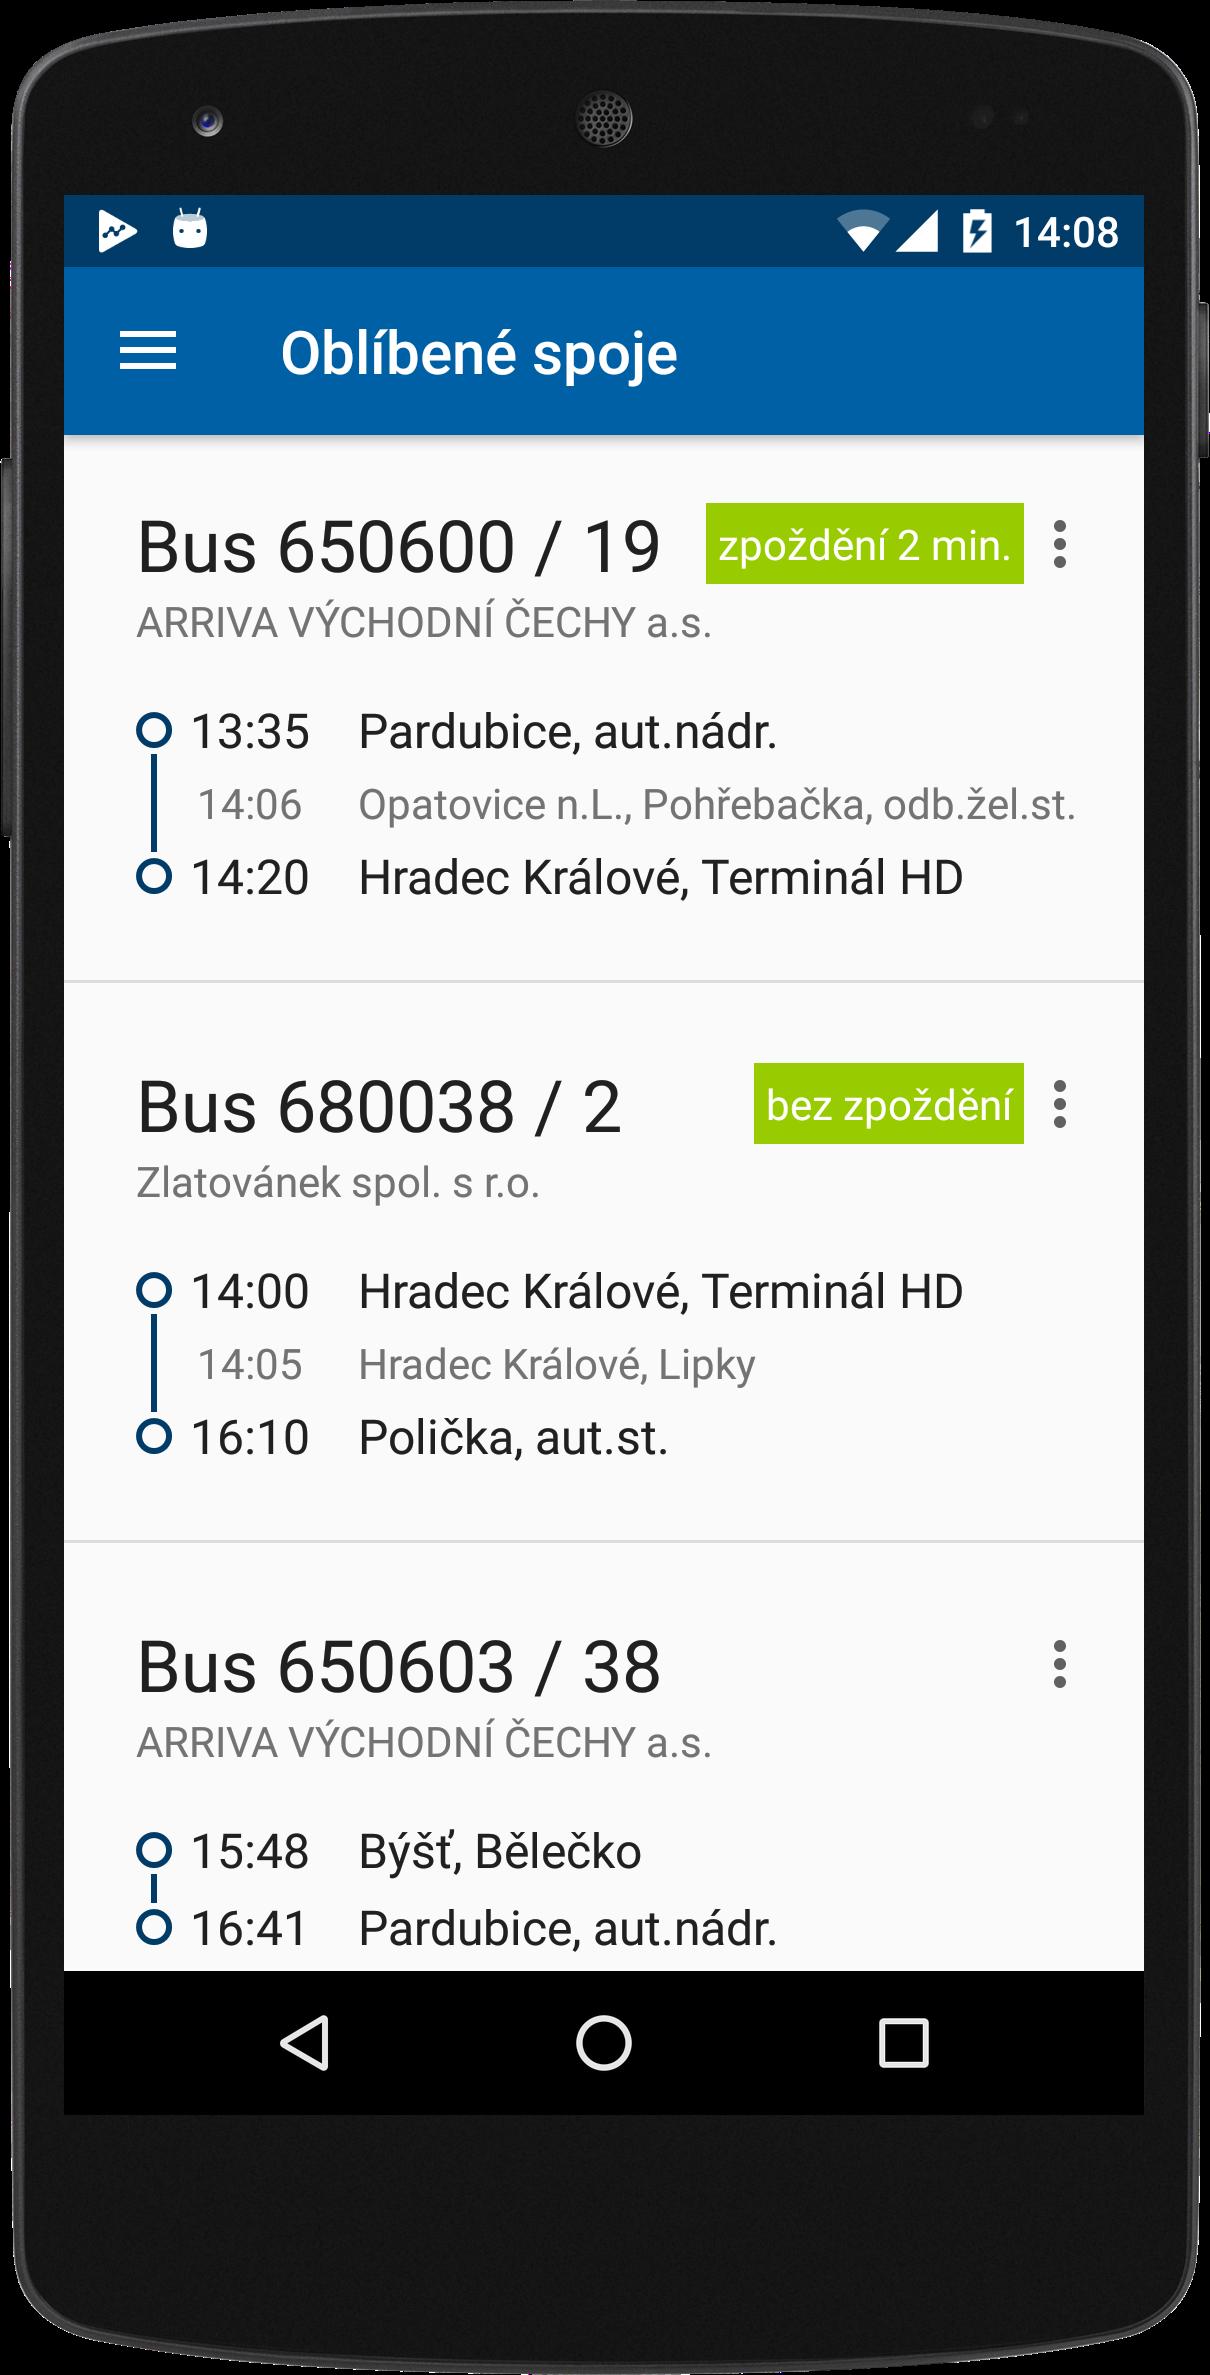 Predstavujeme Mobilni Aplikaci Ids Iredo Pro Cestujici V Pardubickem